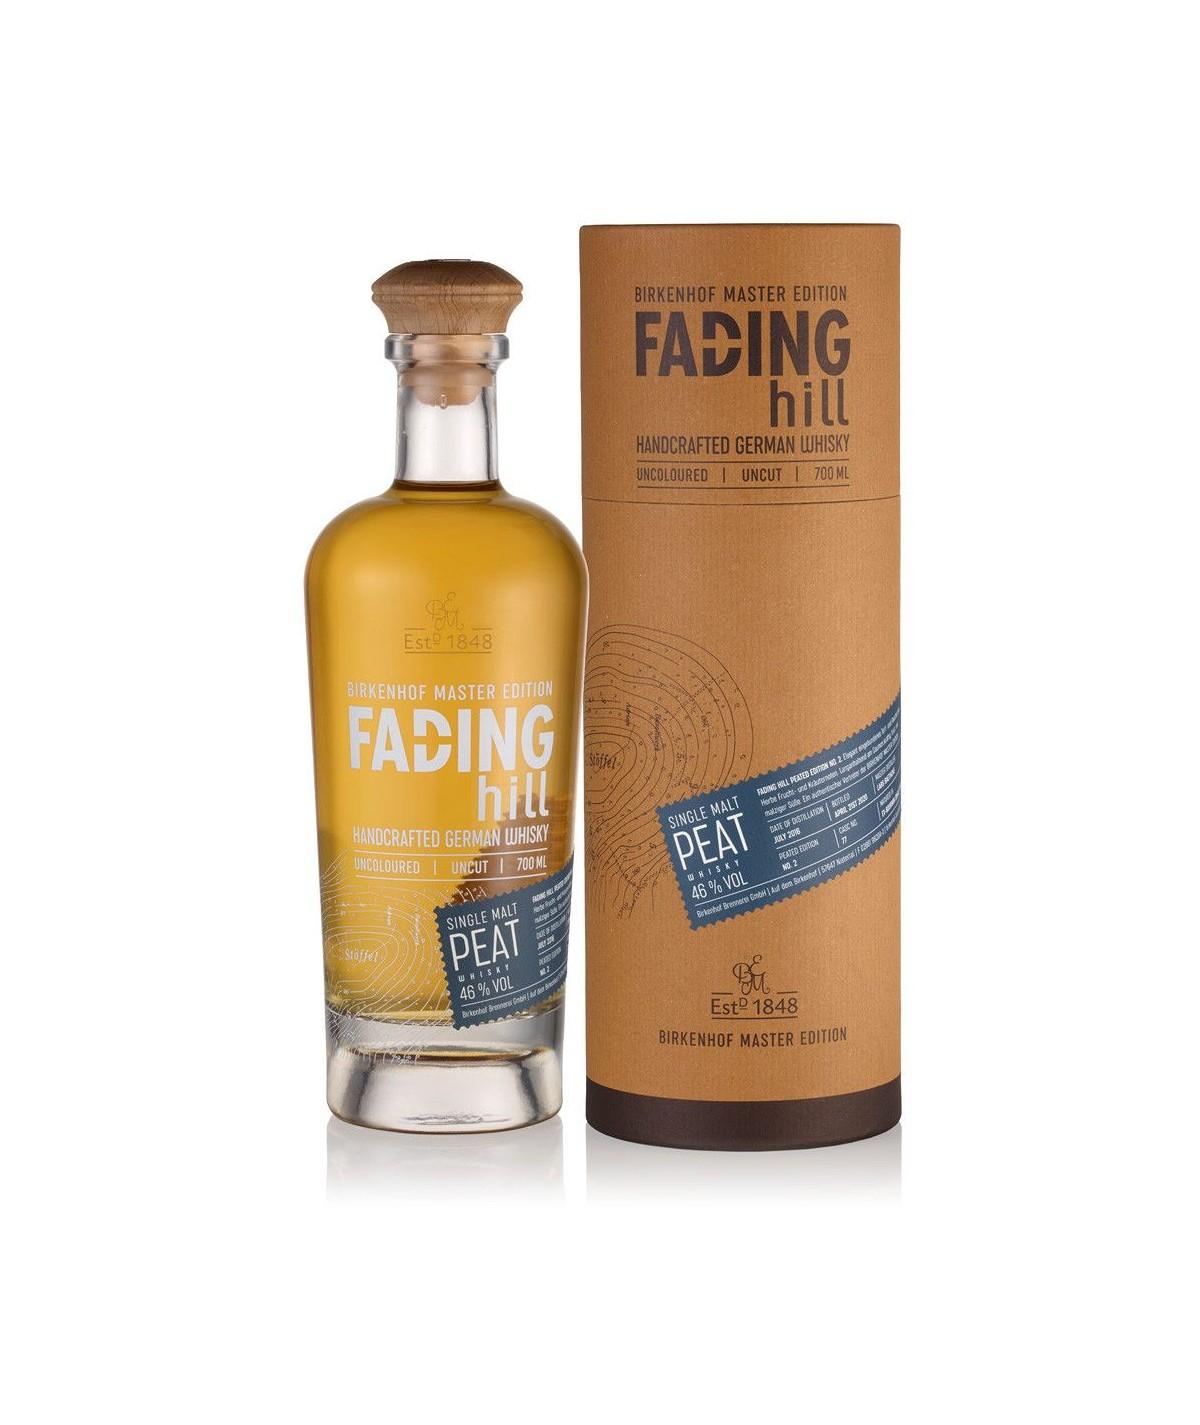 Fading Hill Single Malt Peated Edition No 3 0,7l